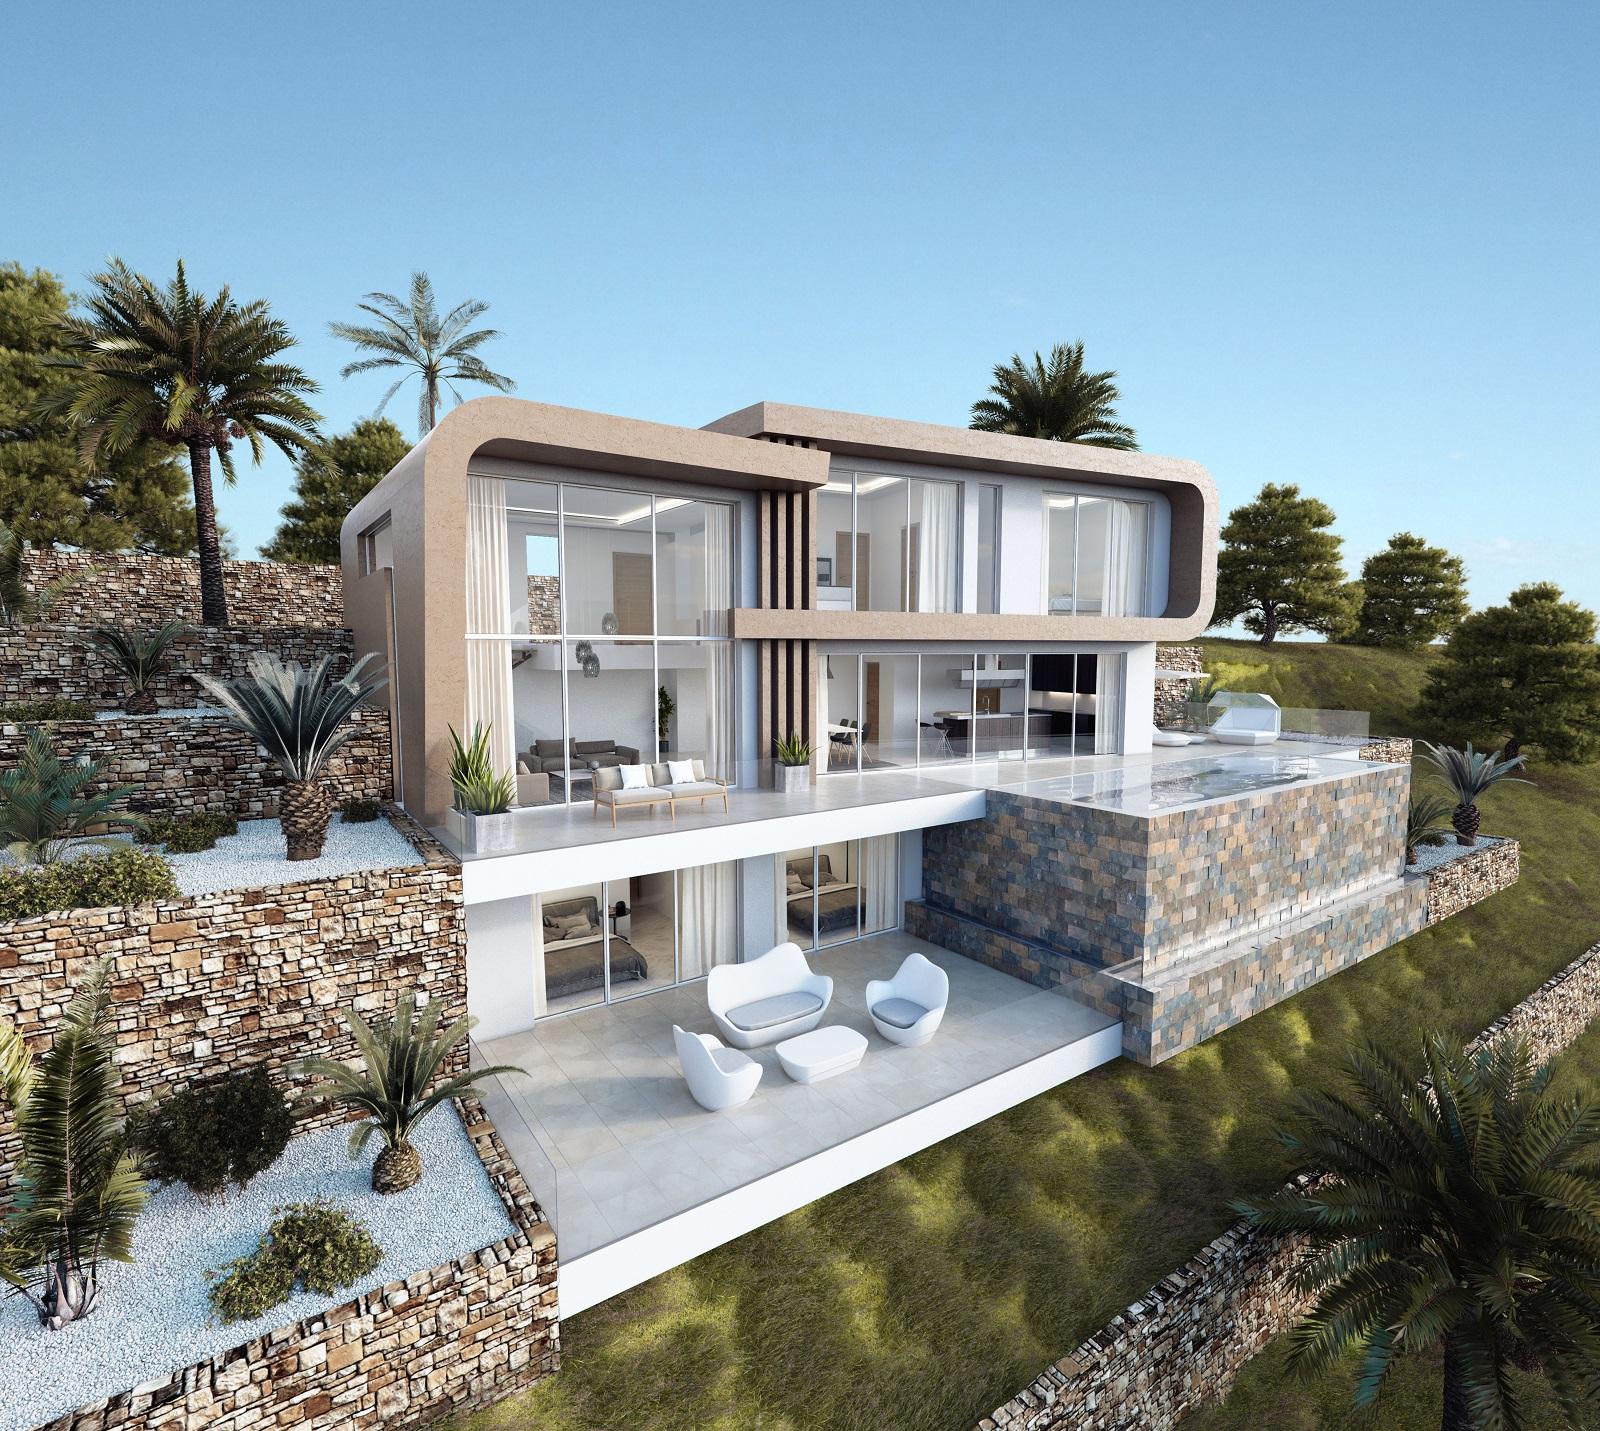 Luxe moderne zeezicht villa in moraira spanje specials - Moderne entreehal ...